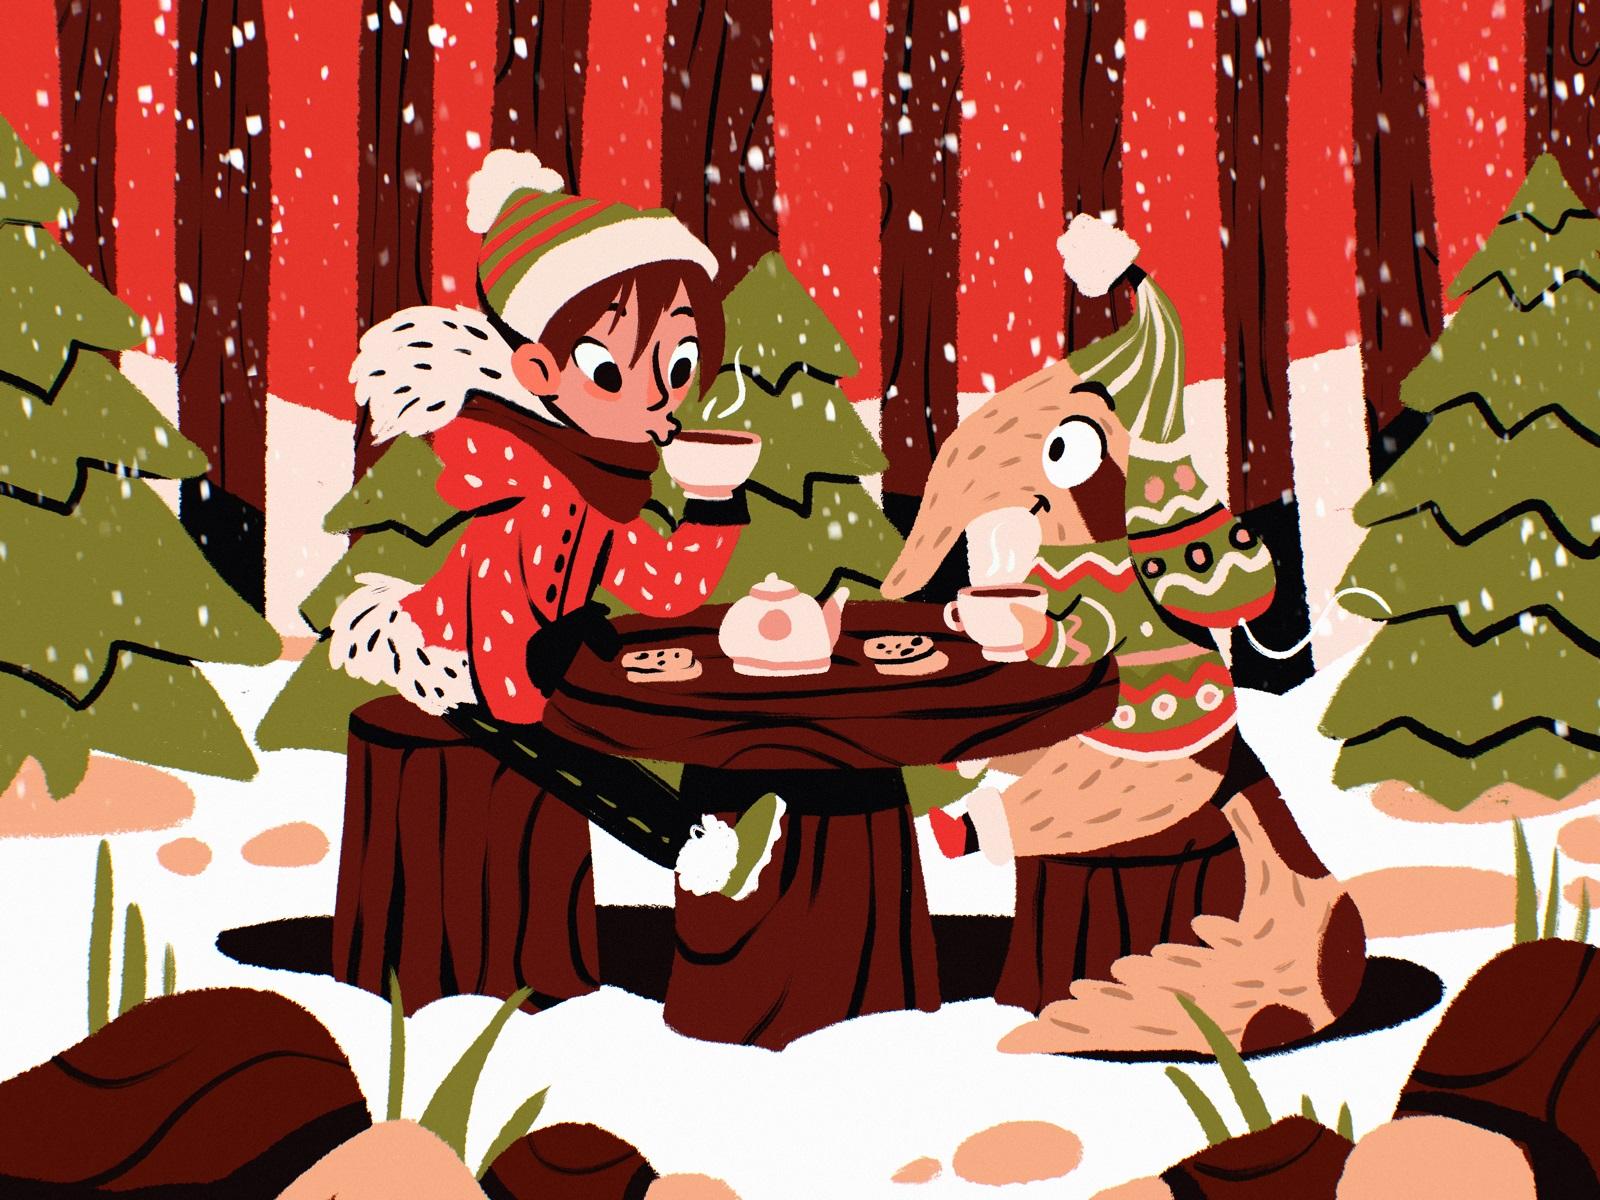 winter wonderland illustration tubik arts